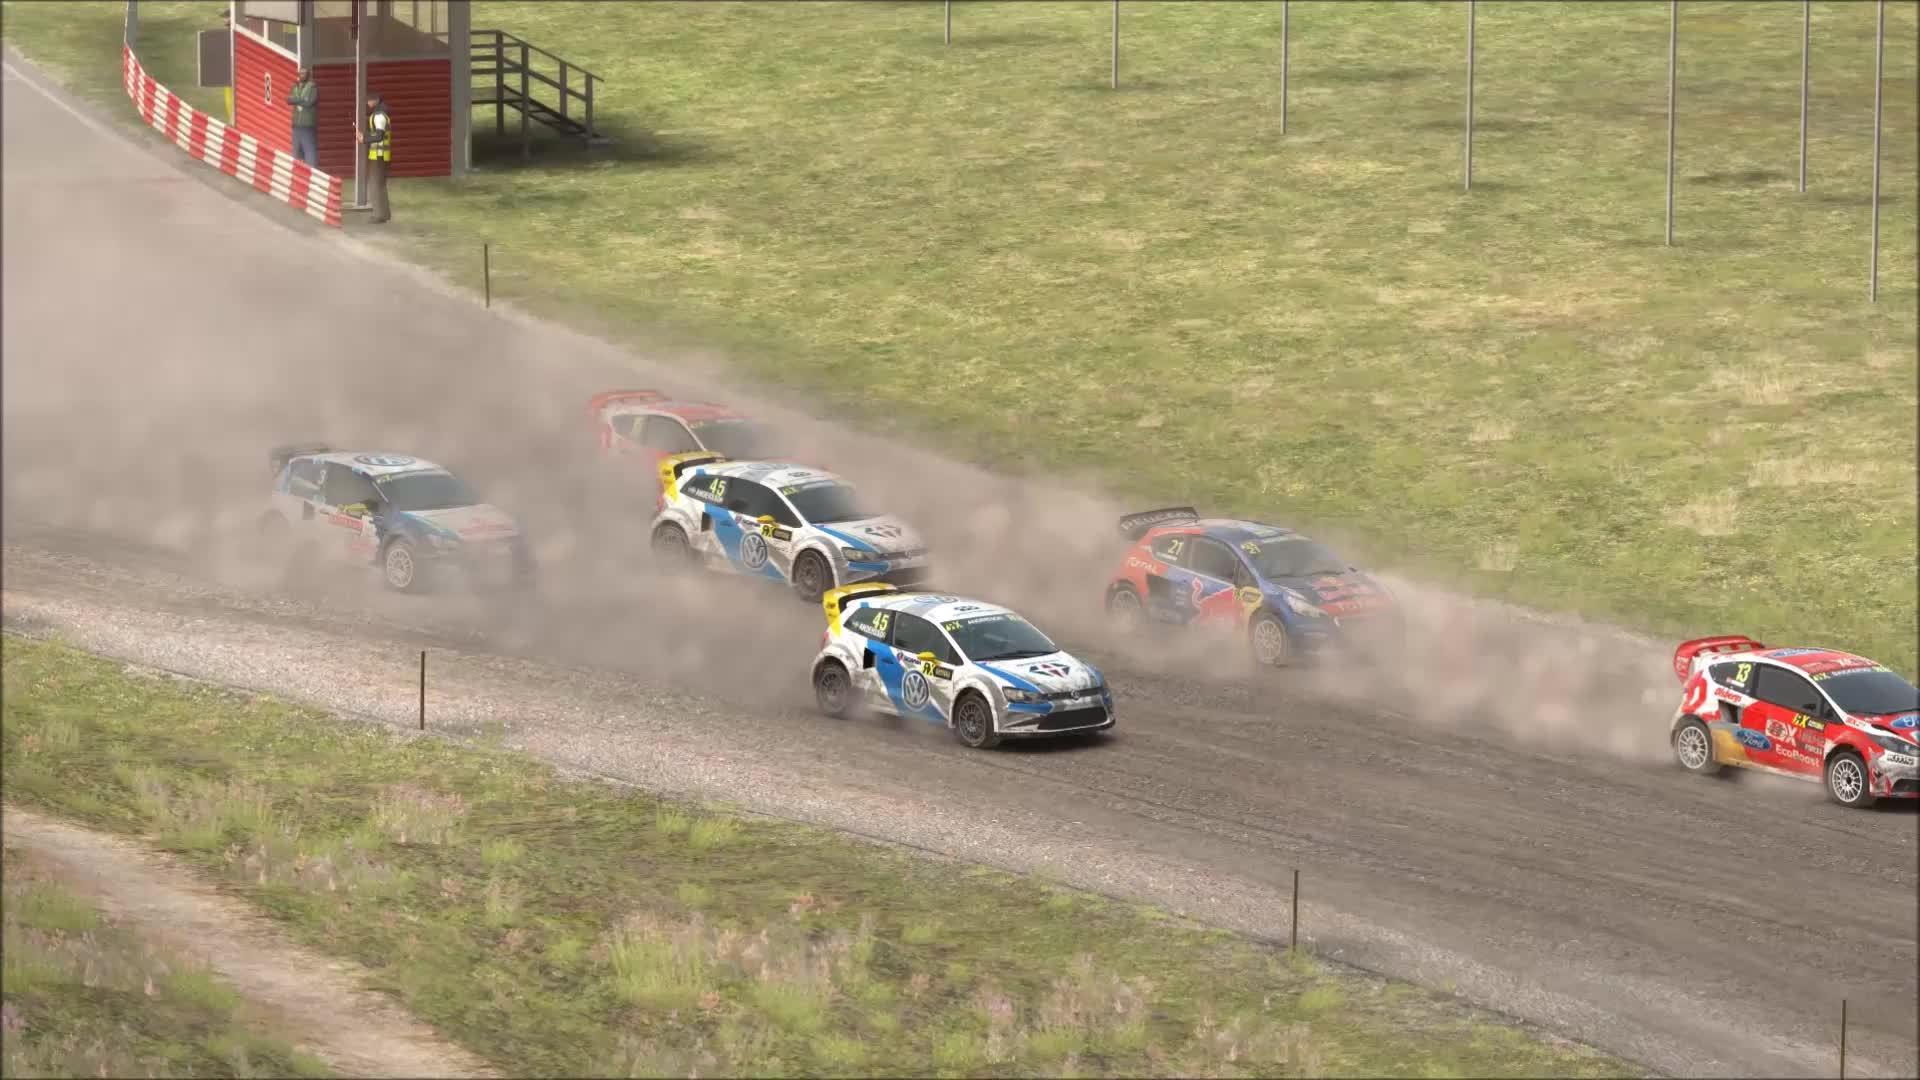 60fpsgaminggifs, 60fpsgfy, rallycross, RX Update GIFs